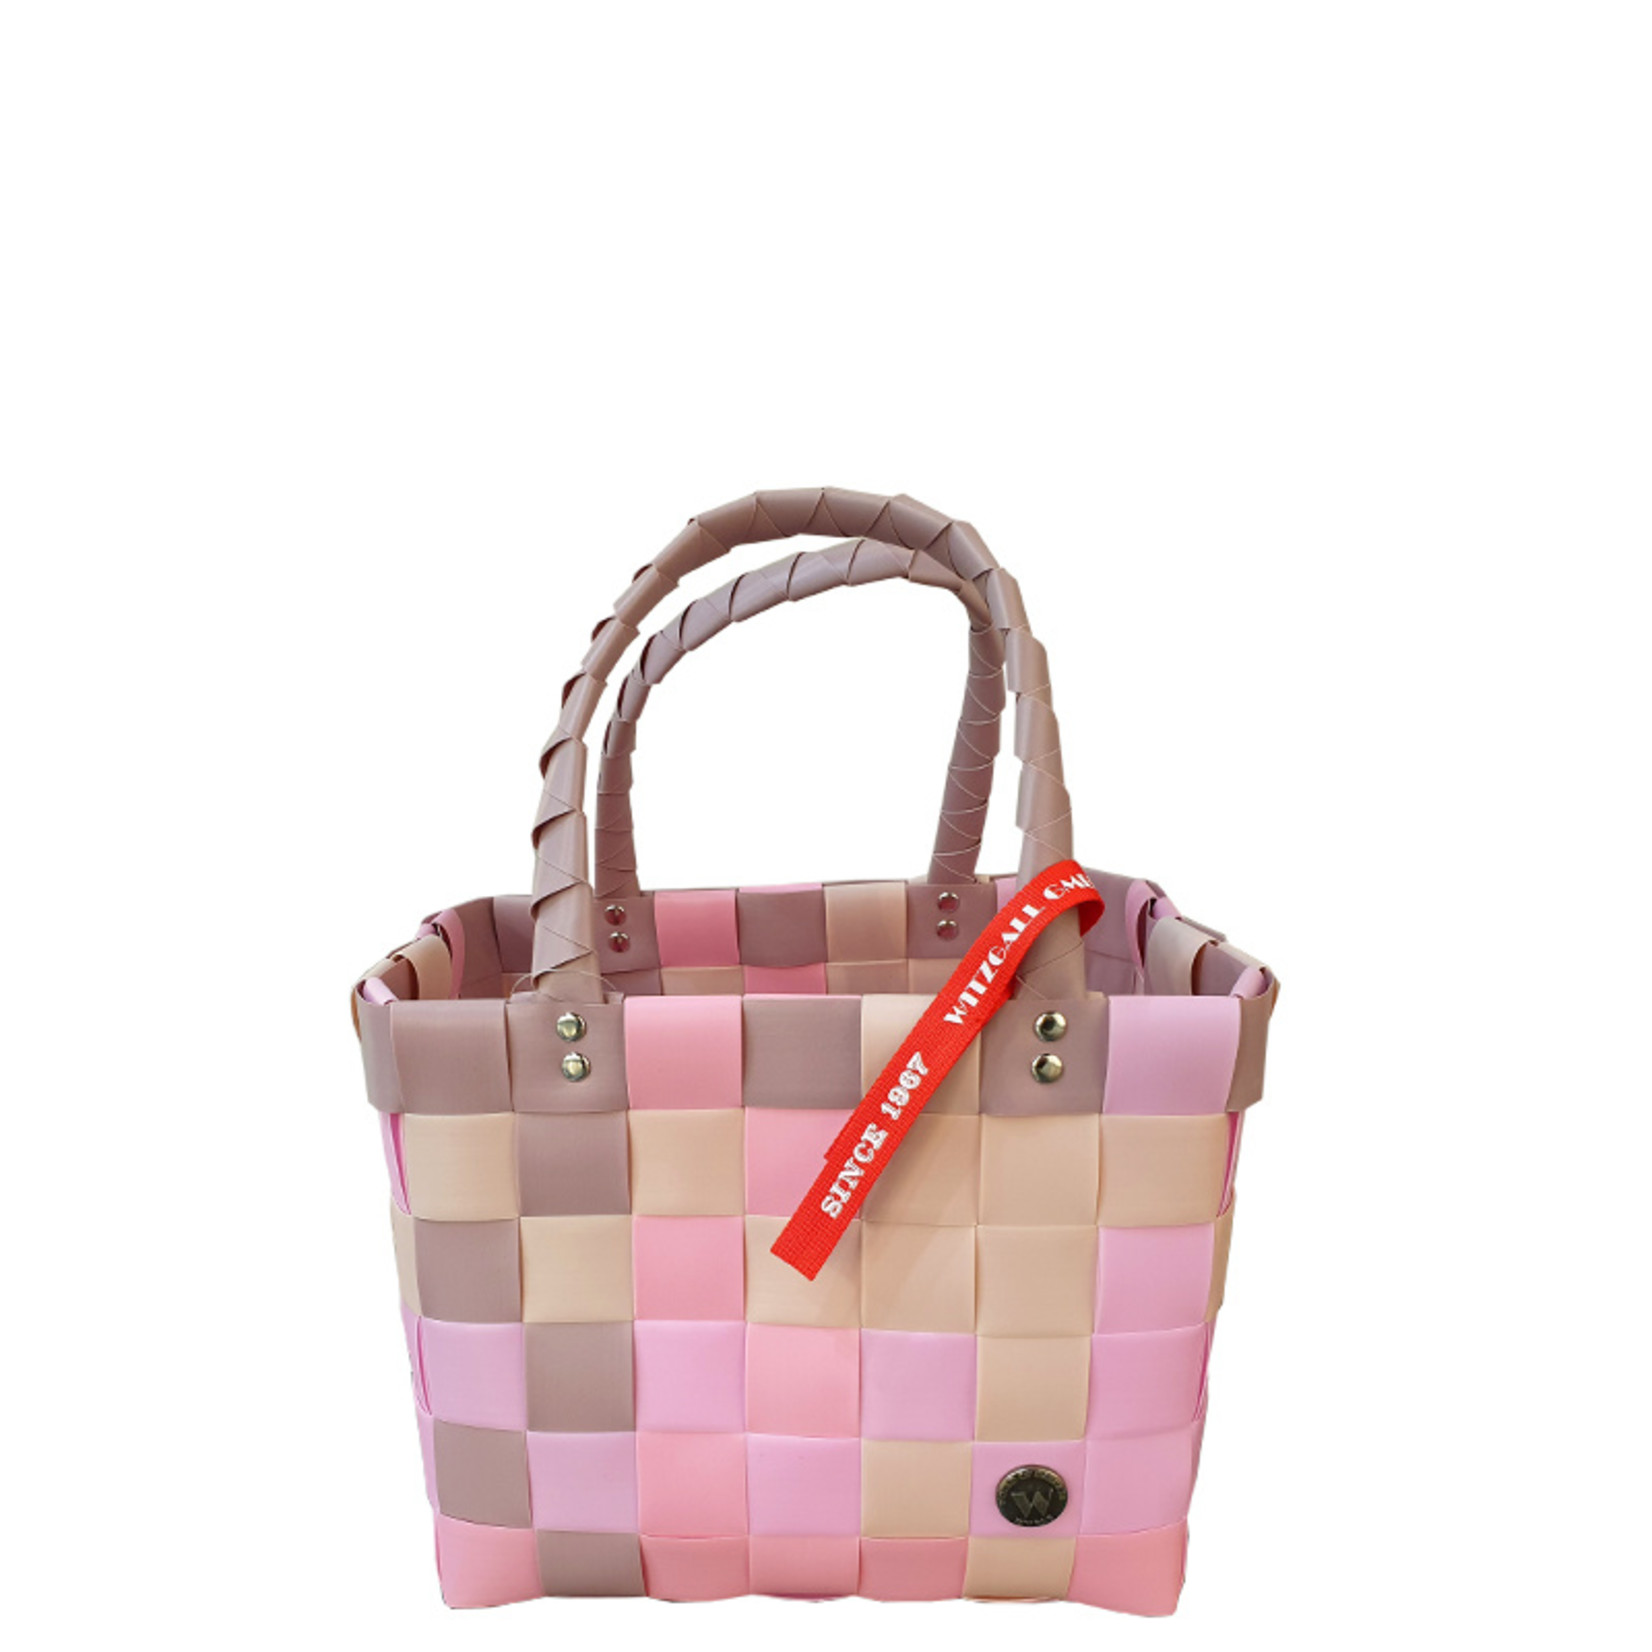 ICE BAG Taschen ICE BAG Mini Shopper 5008-36 | Original Witzgall Tasche | rosa